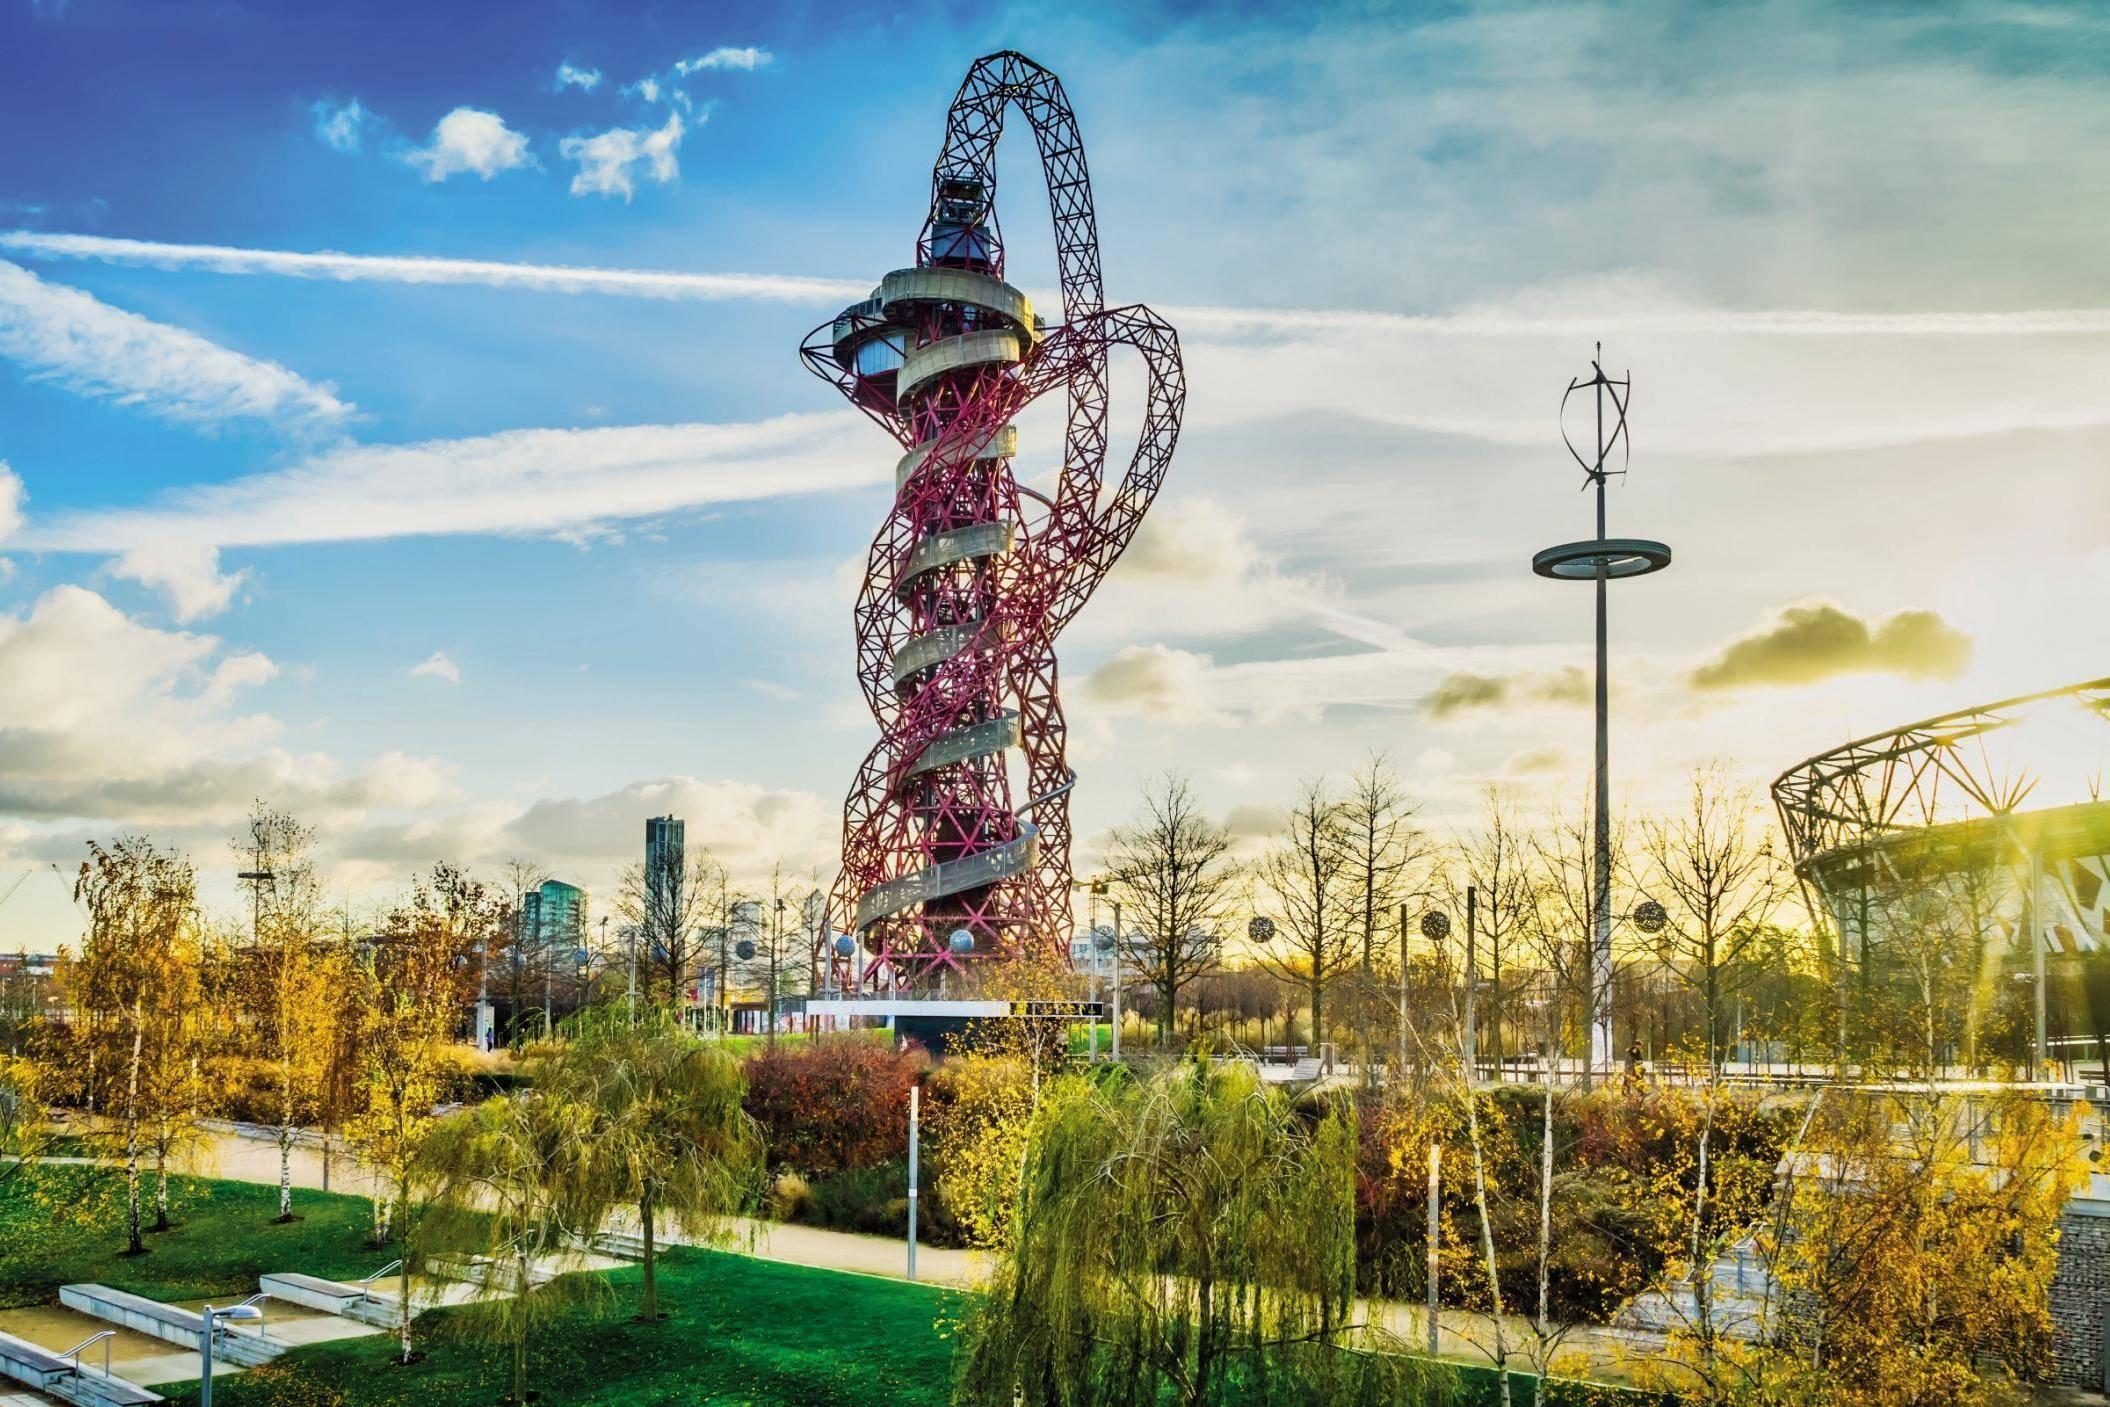 queen-elizabeth-olympic-park-london